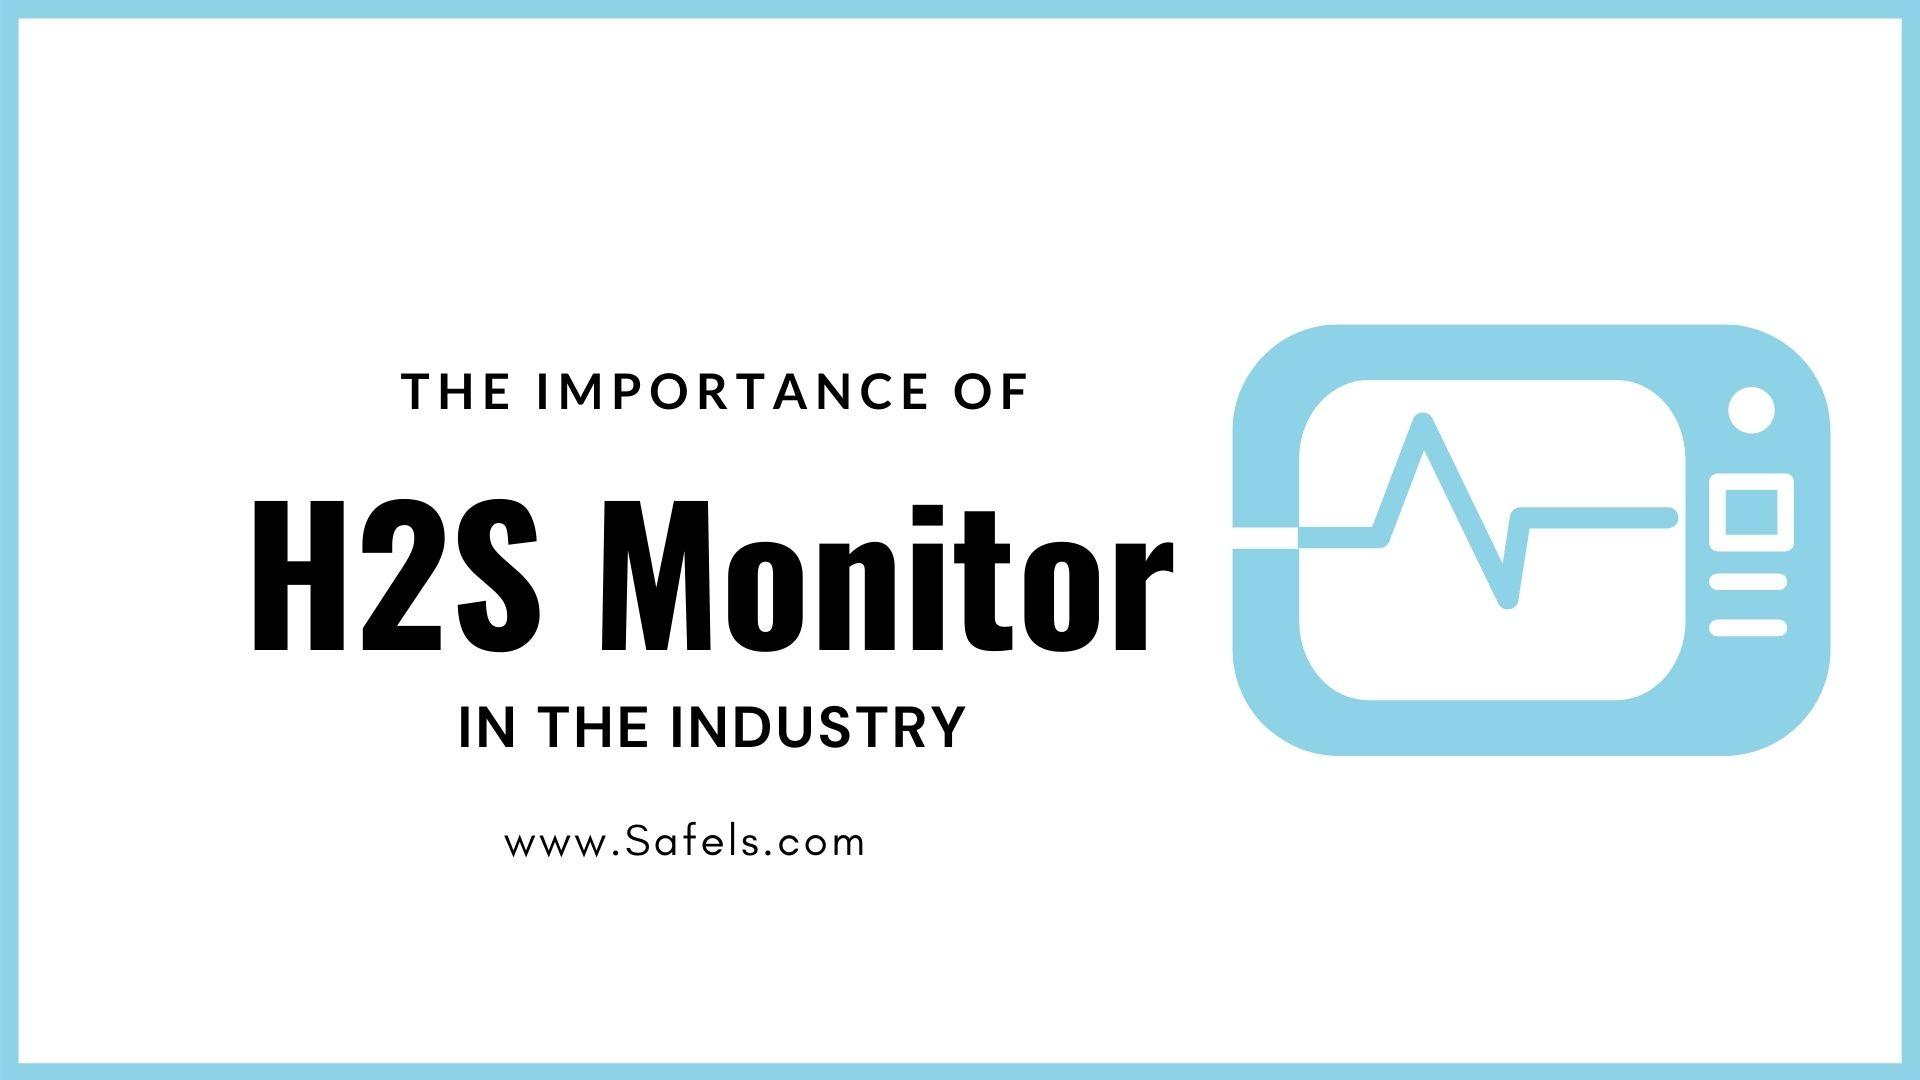 H2S monitor